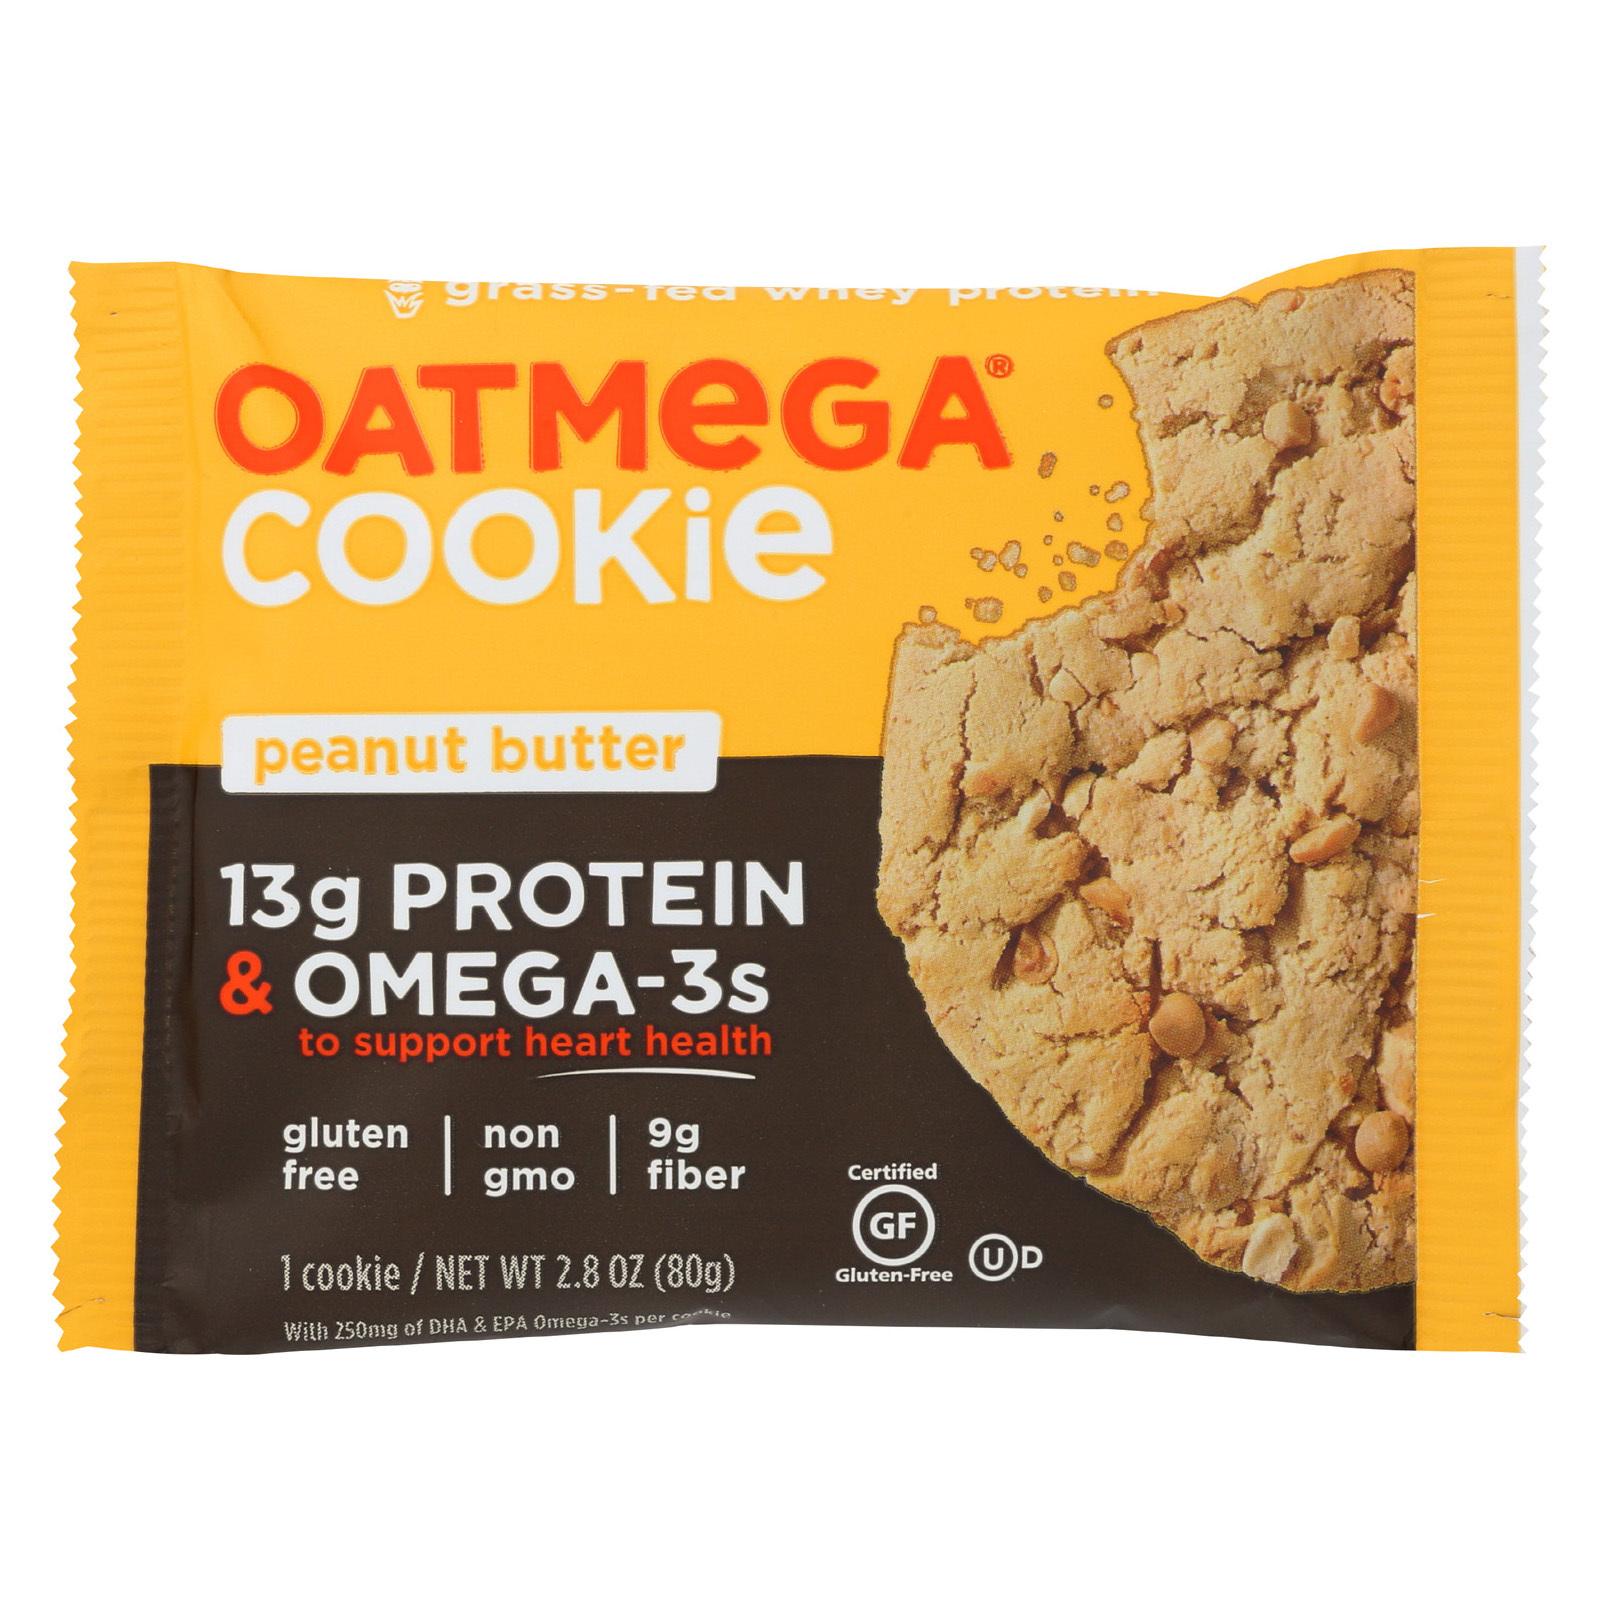 Oatmegabar Cookie - Peanut Butter - Case of 12 - 2.8 oz